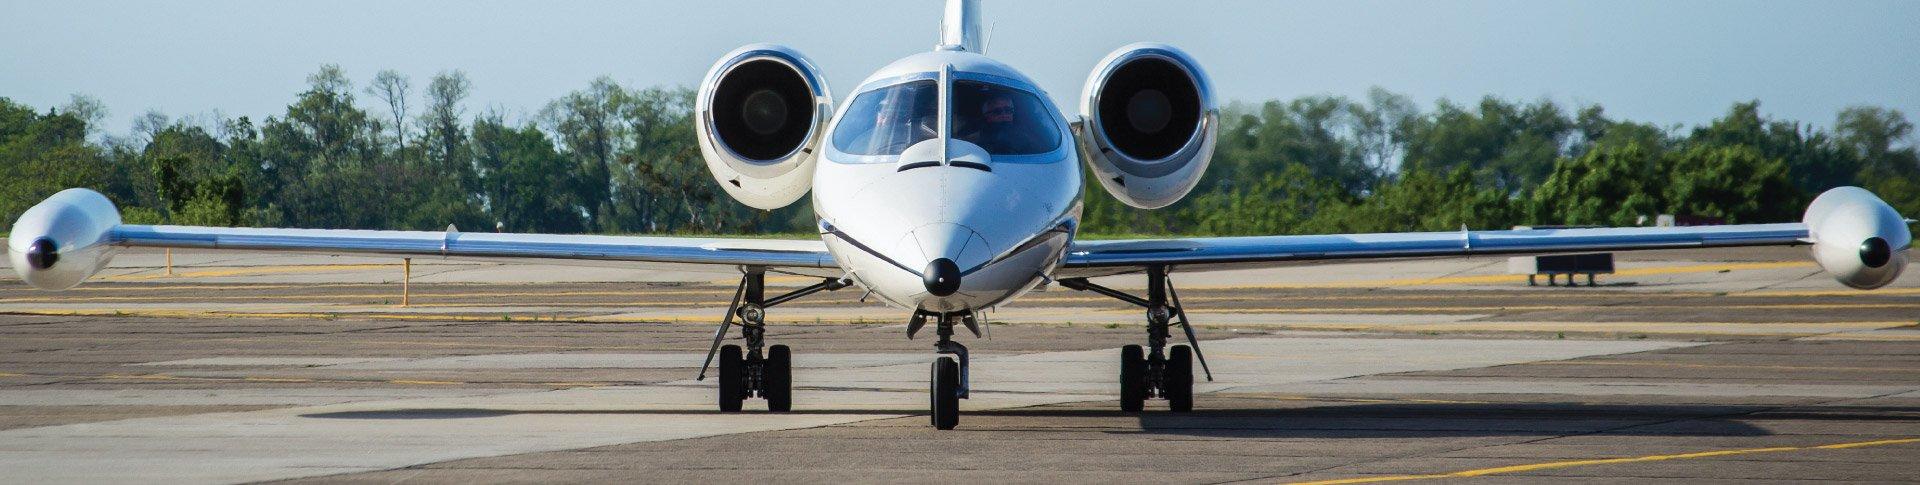 Aircraft Mechanic and Avionics Training - PIA: School for